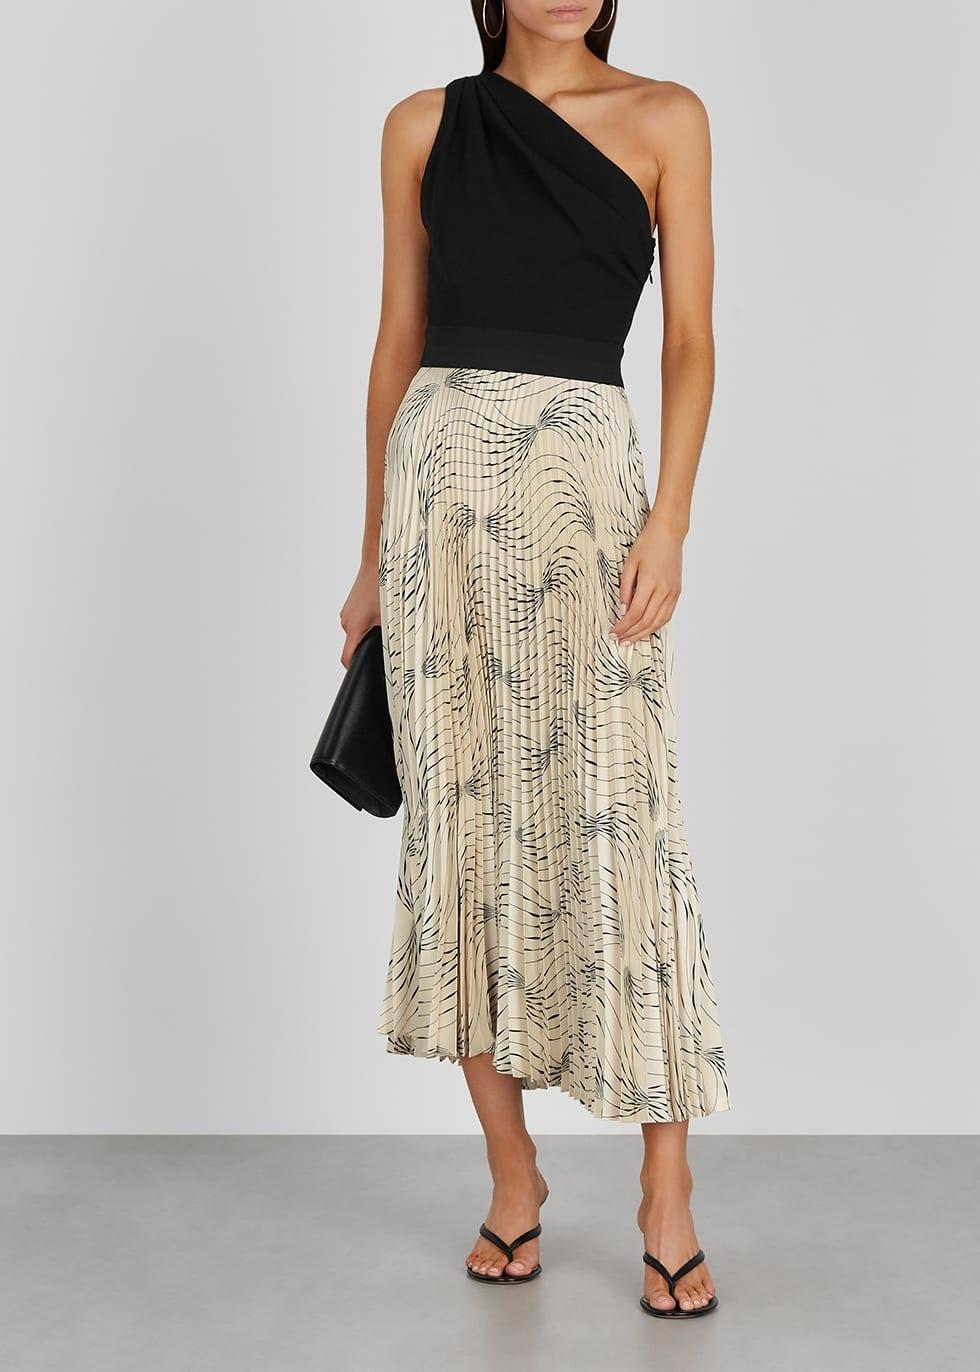 Victoria Beckham One Shoulder Jersey And Satin Midi Dress We Select Dresses Satin Midi Dress Metallic Knit Dress Chiffon Mini Dress [ 1372 x 980 Pixel ]